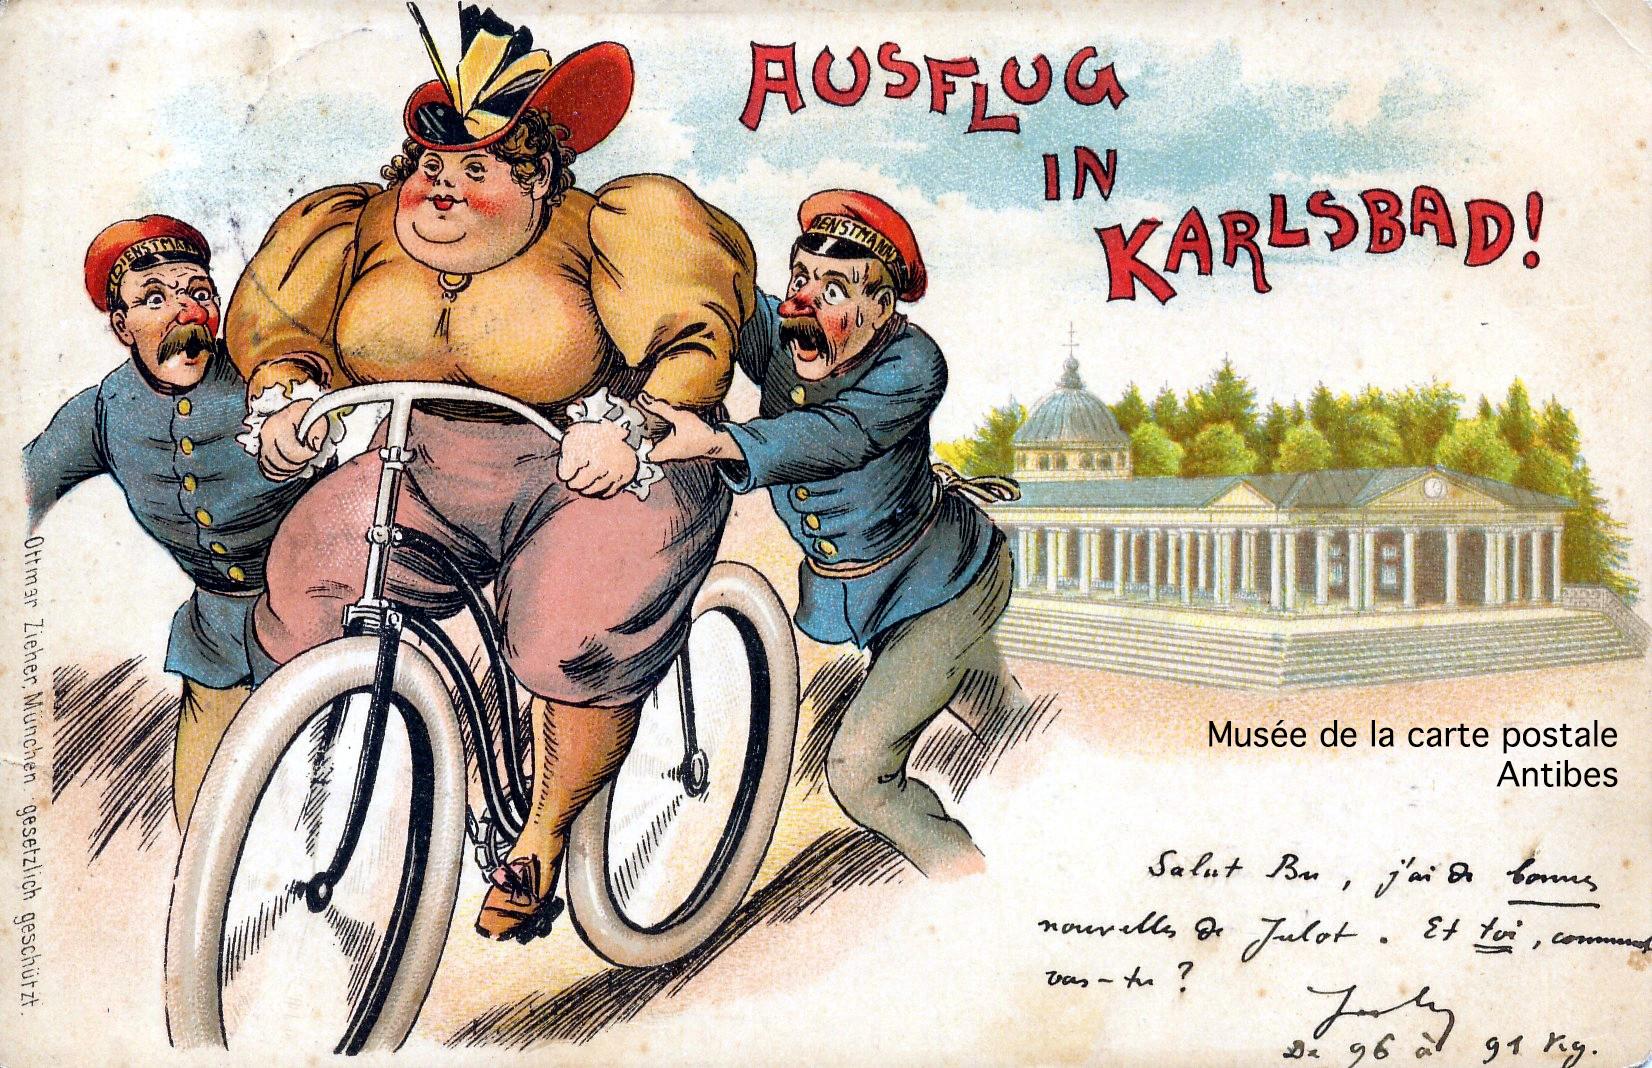 Carte postale, dessin humoristique, dame à vélo.